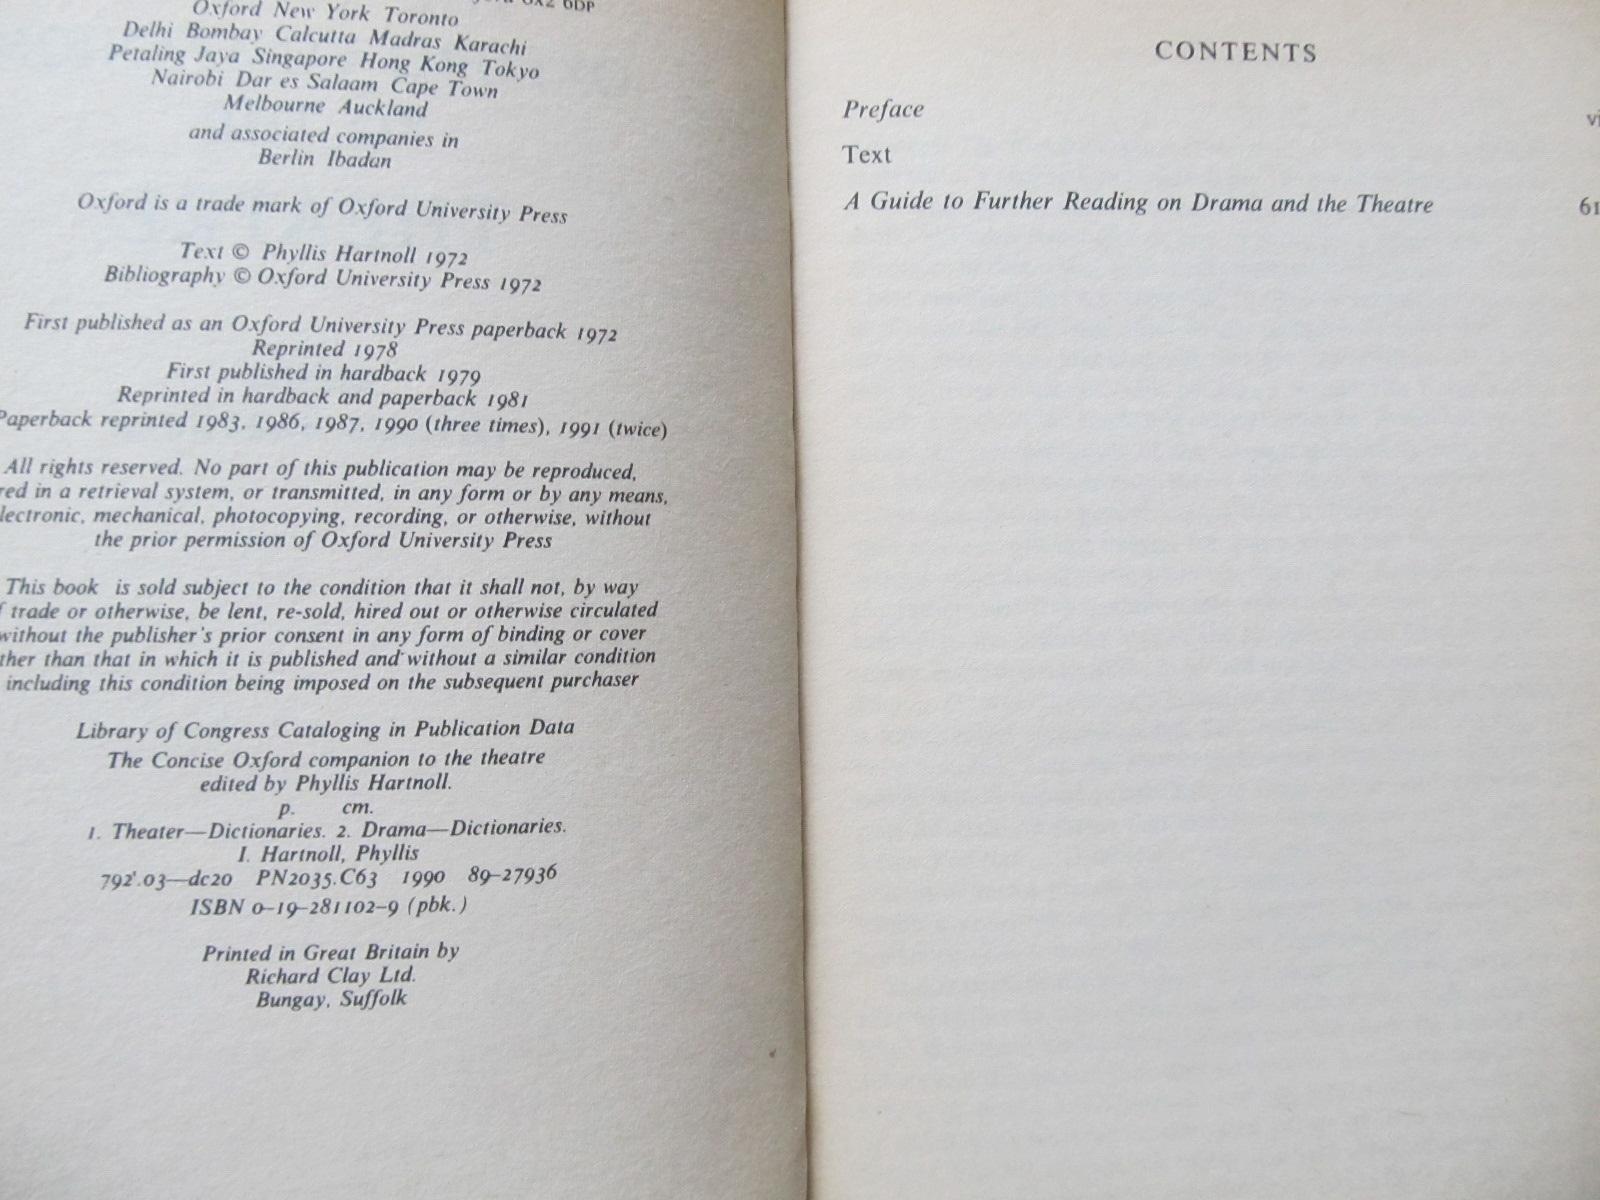 Carte The concise Oxford companion to the Theatre - ***